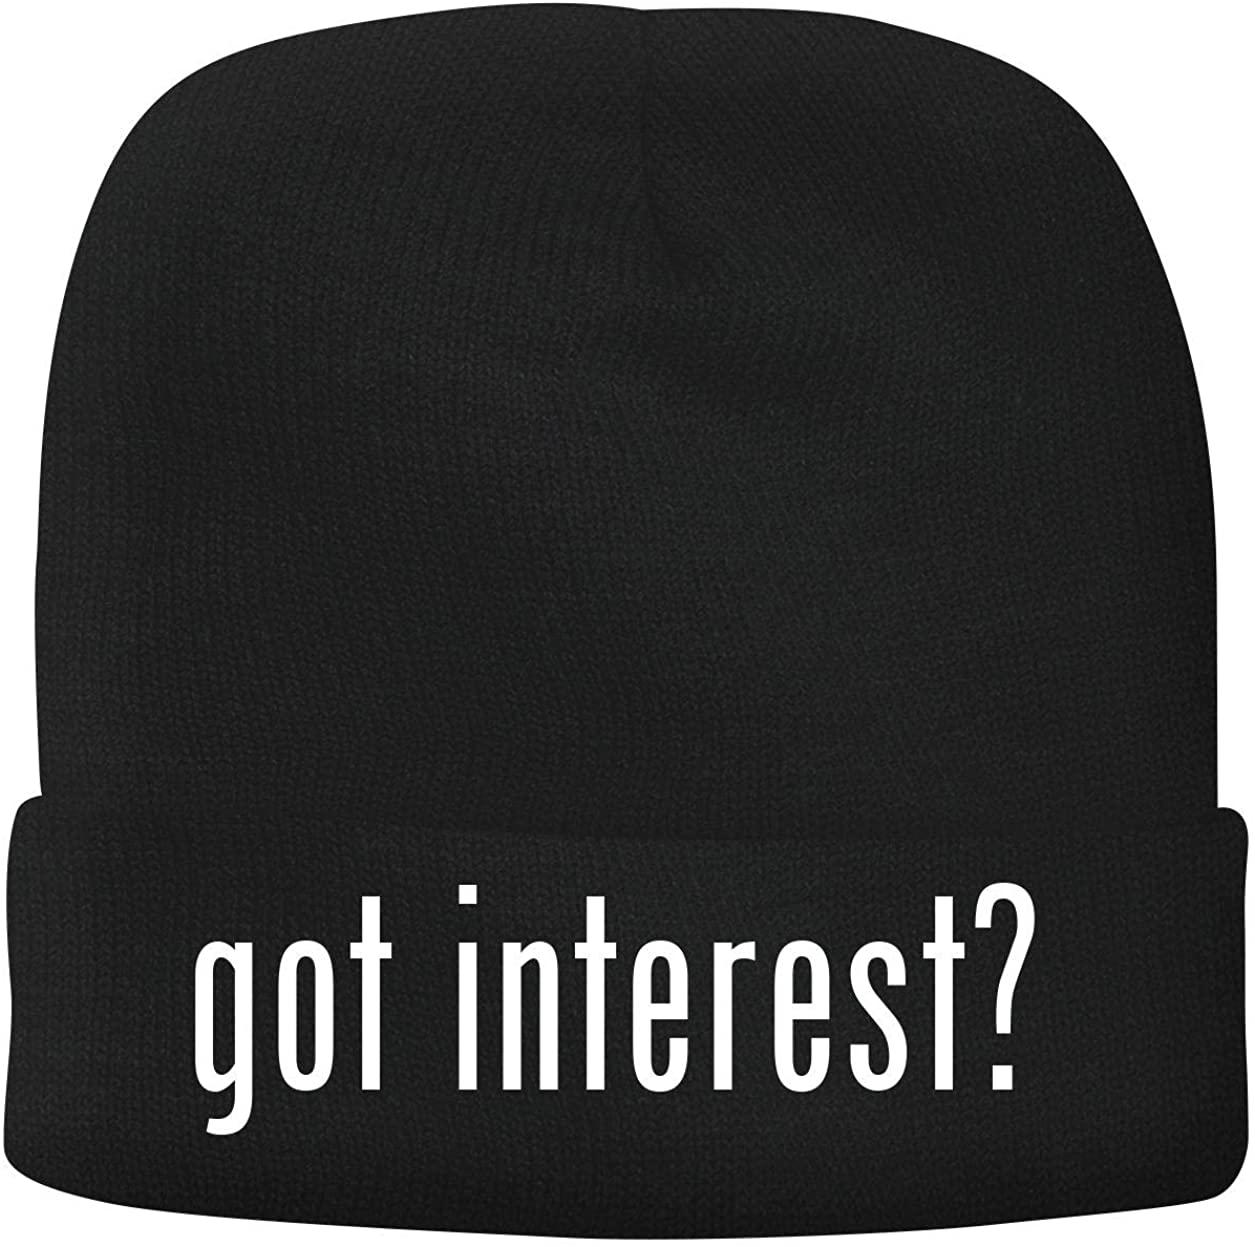 BH Cool Designs got Interest? - Mens Soft & Comfortable Beanie Hat Cap